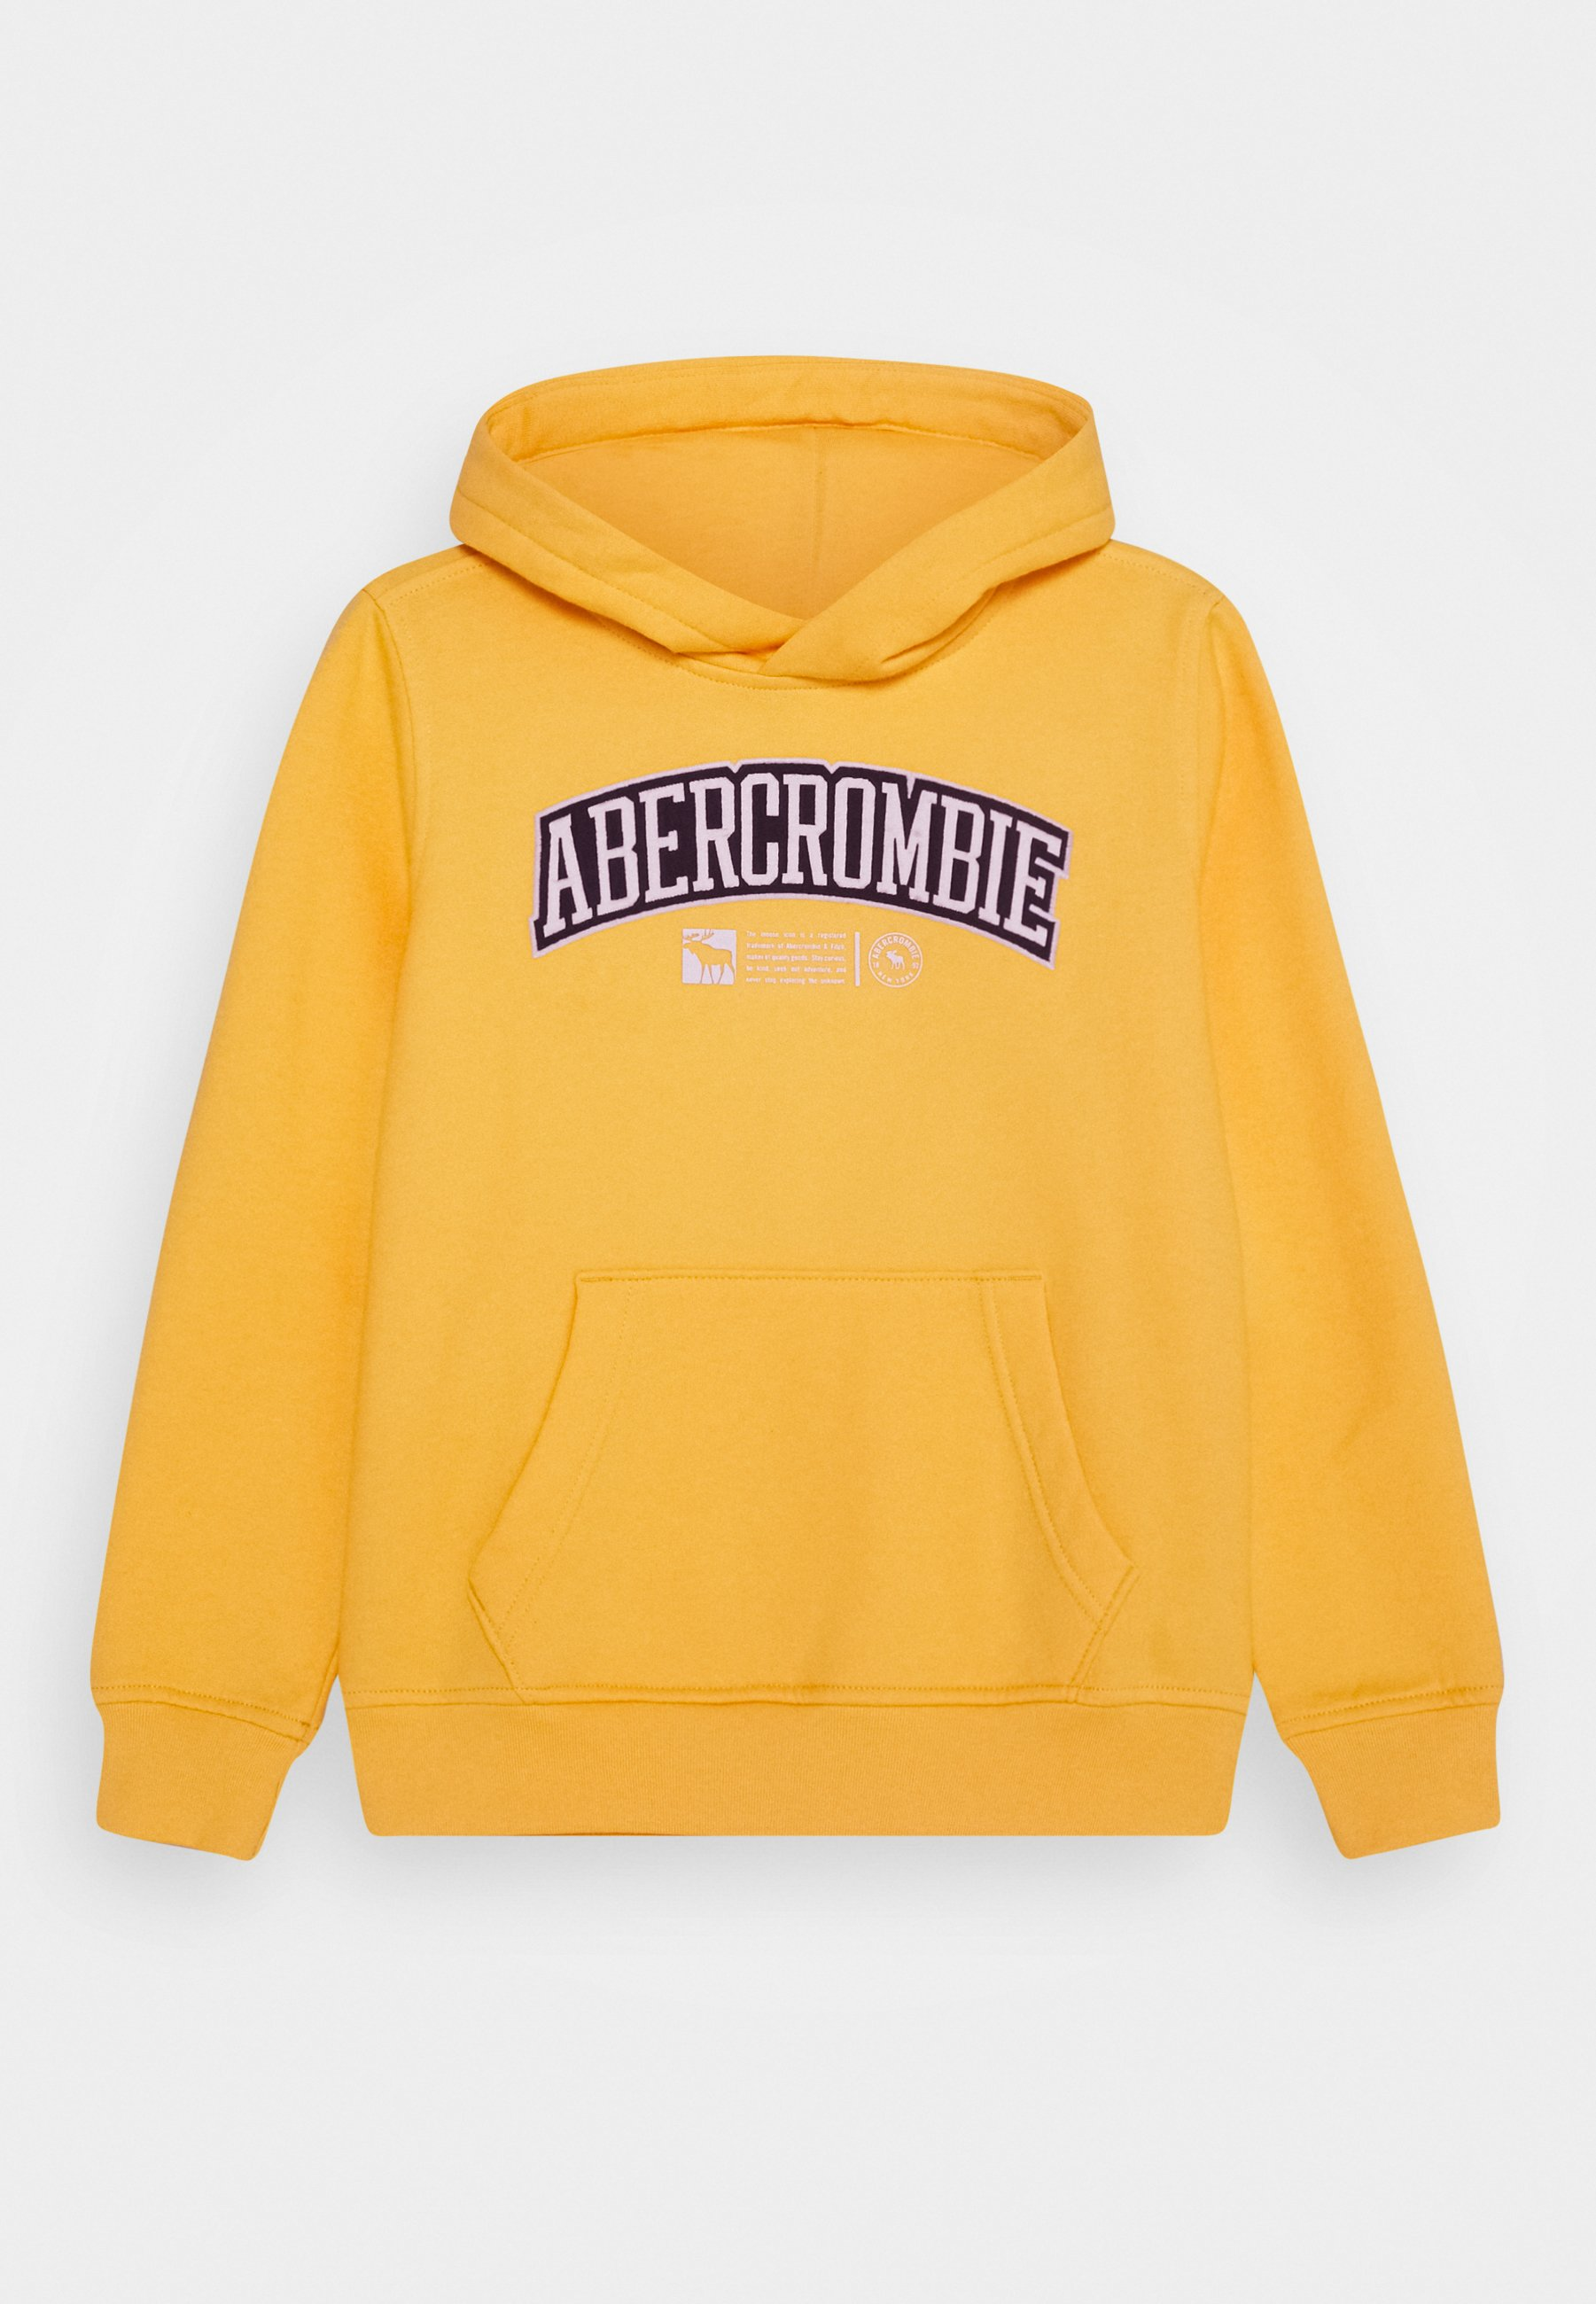 Abercrombie & Fitch LOGO Sweat à capuche yellow ZALANDO.FR